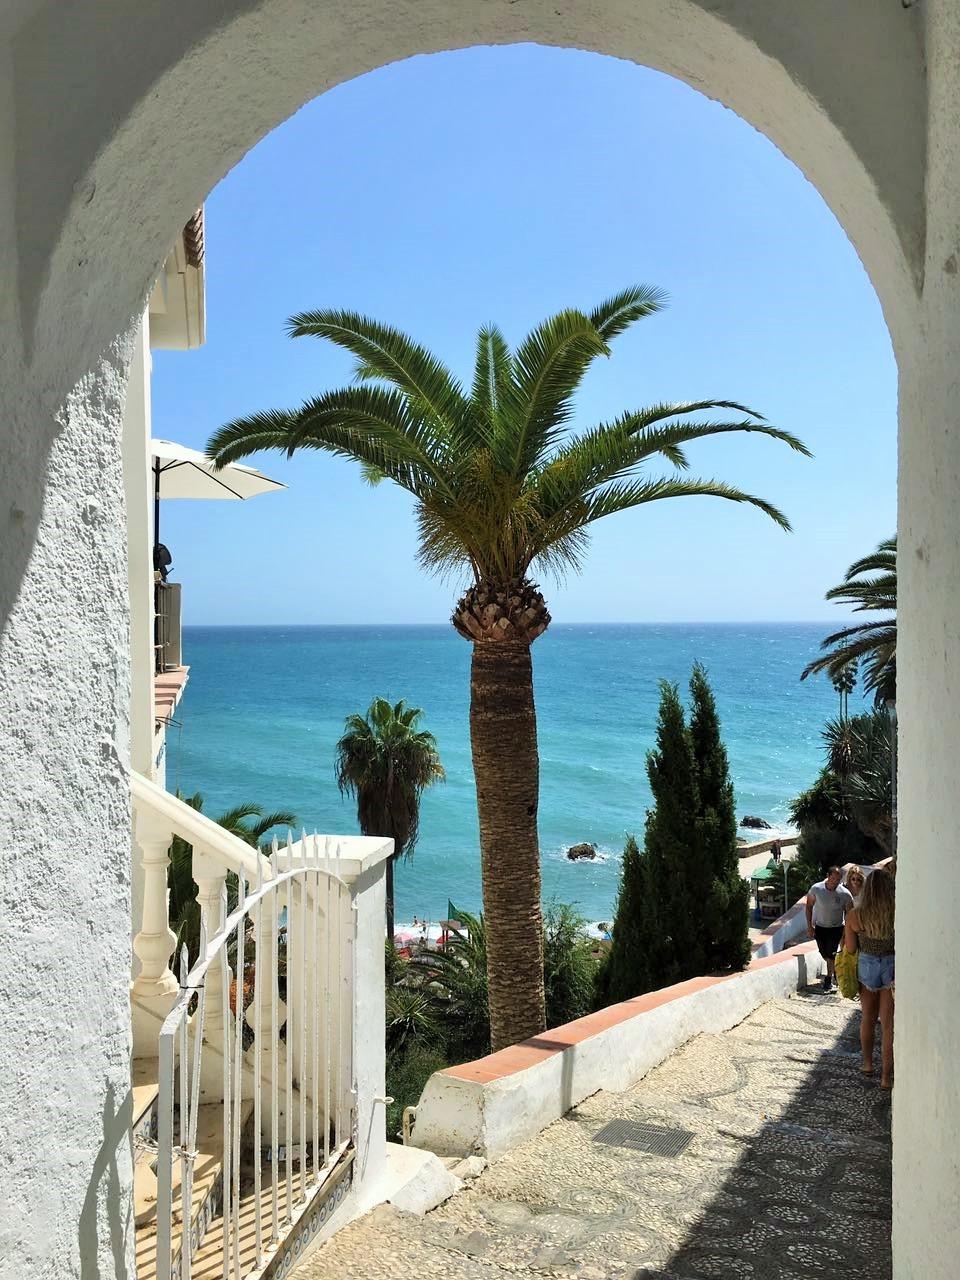 nerja-cosiest-place-costa-del-sol-5d5995